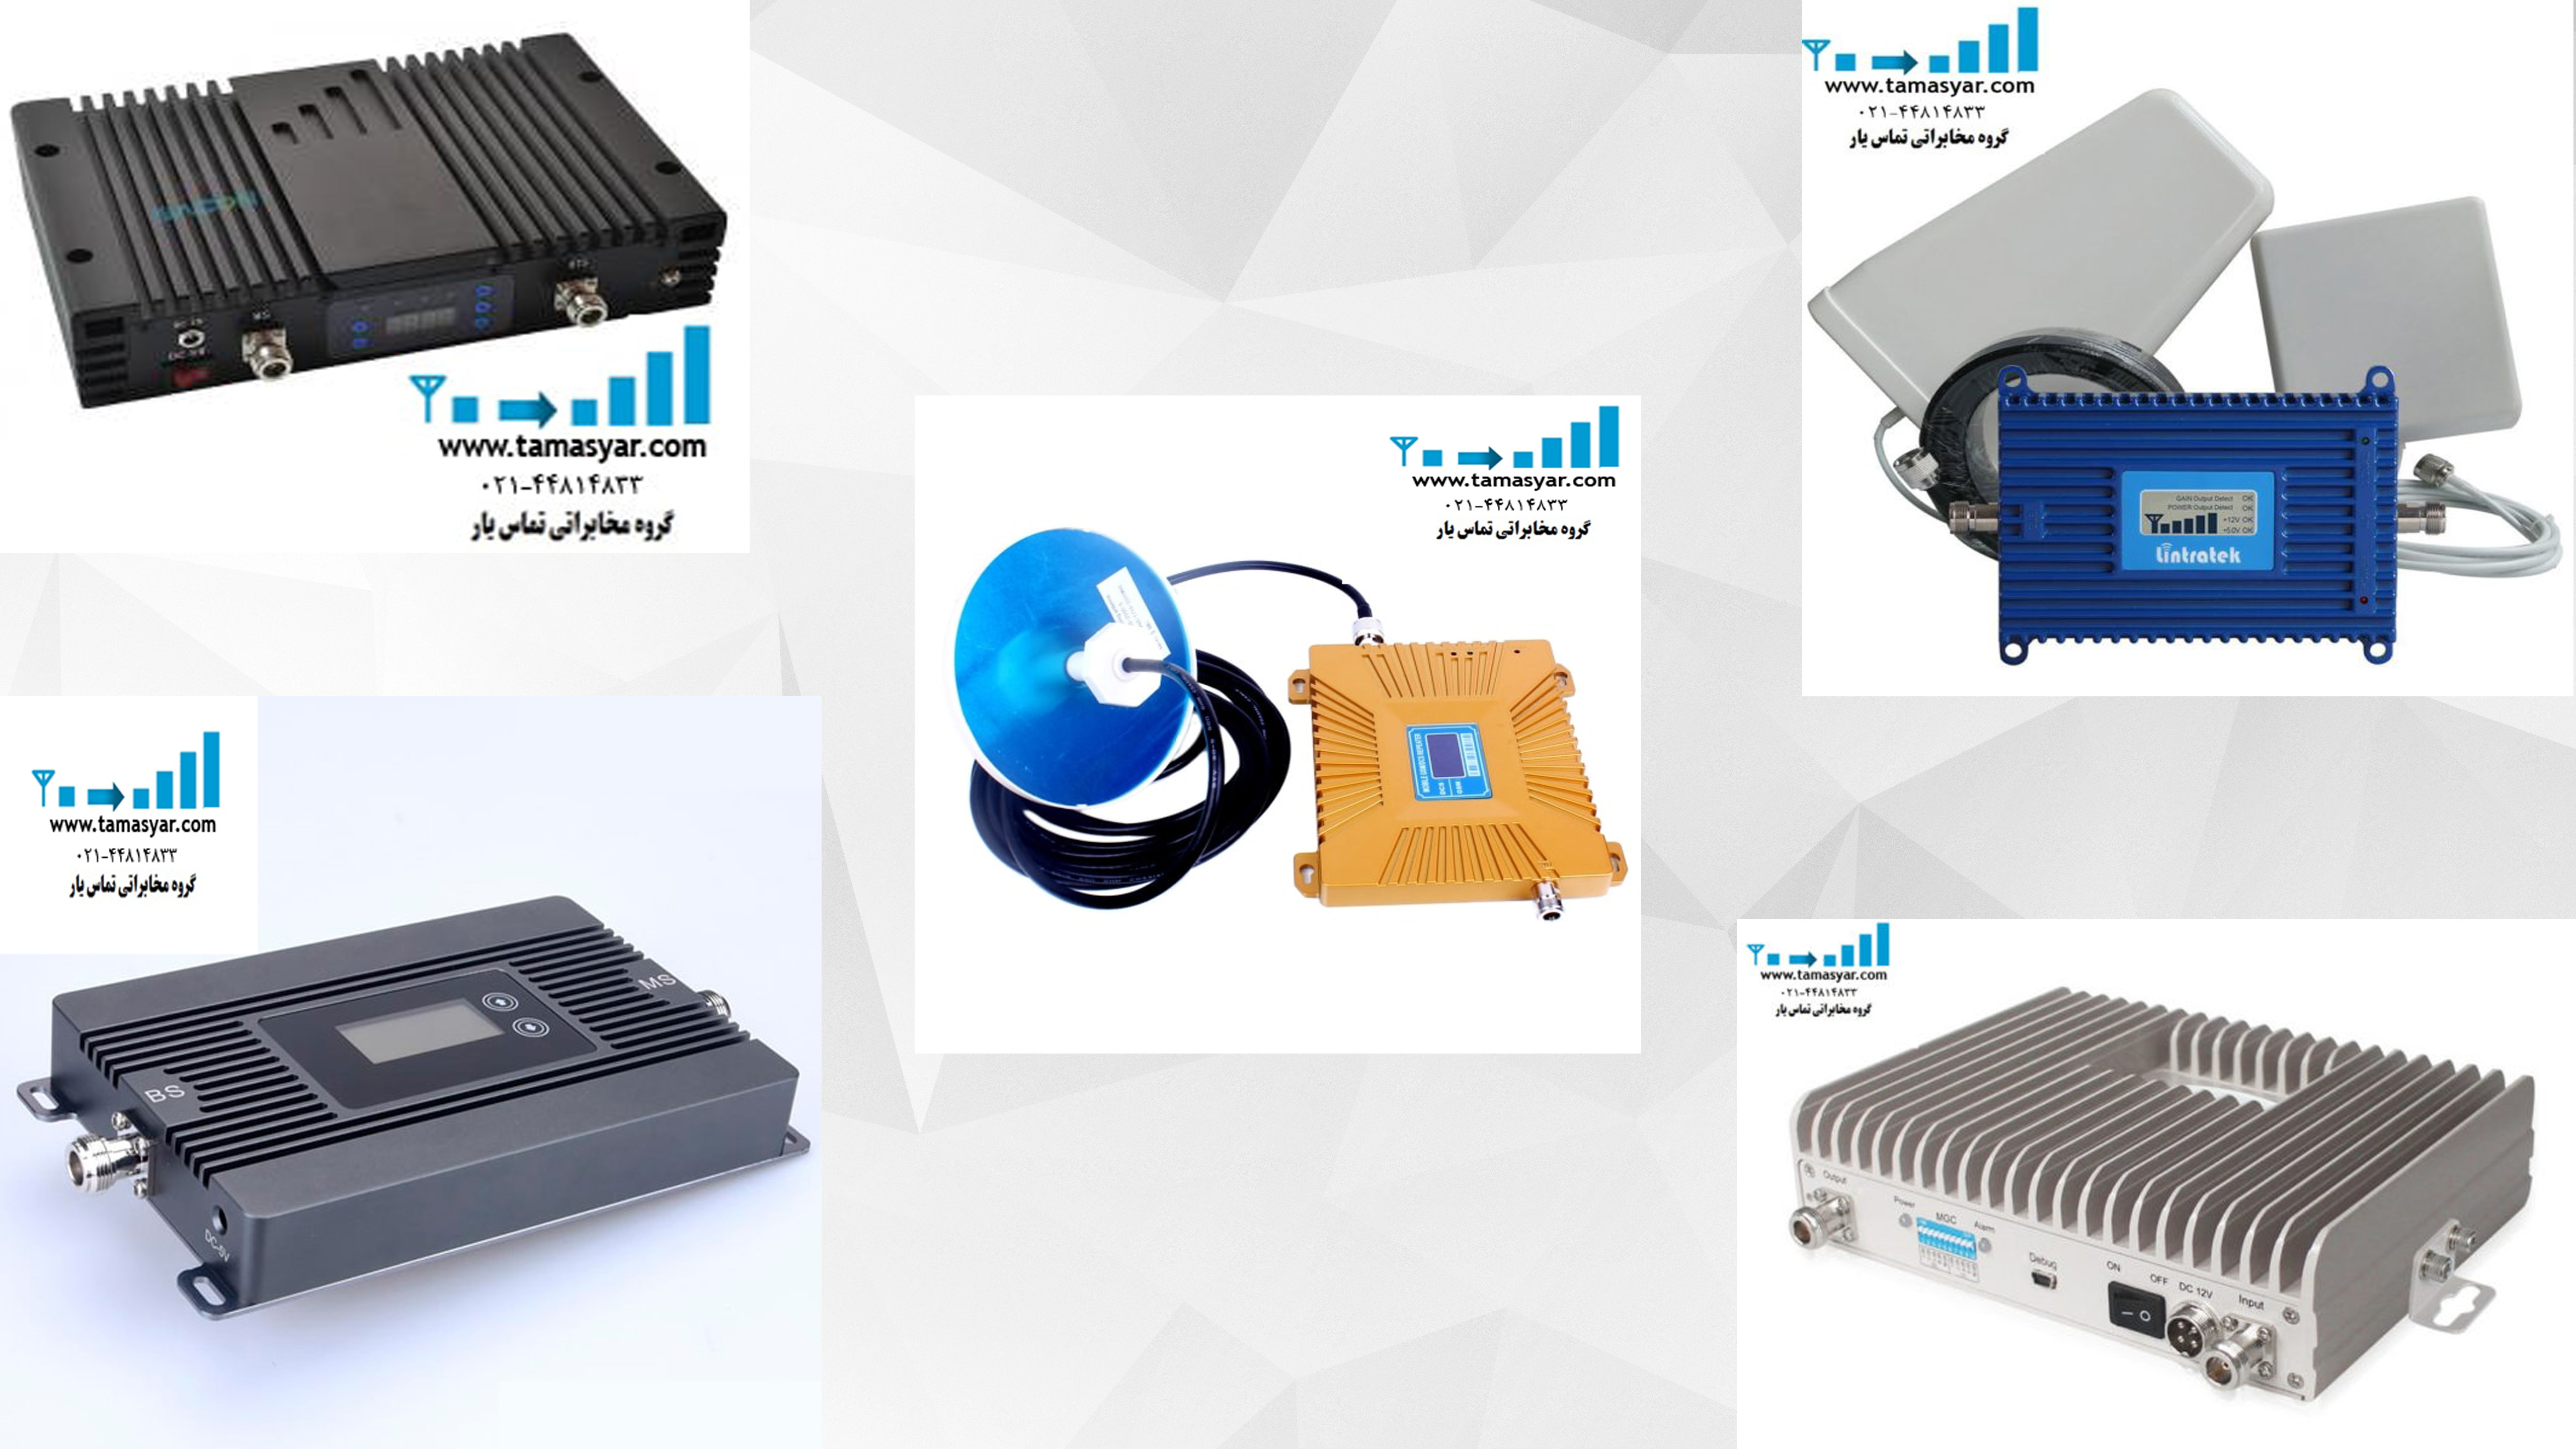 قویترین سیستم تقویت آنتن موبایل